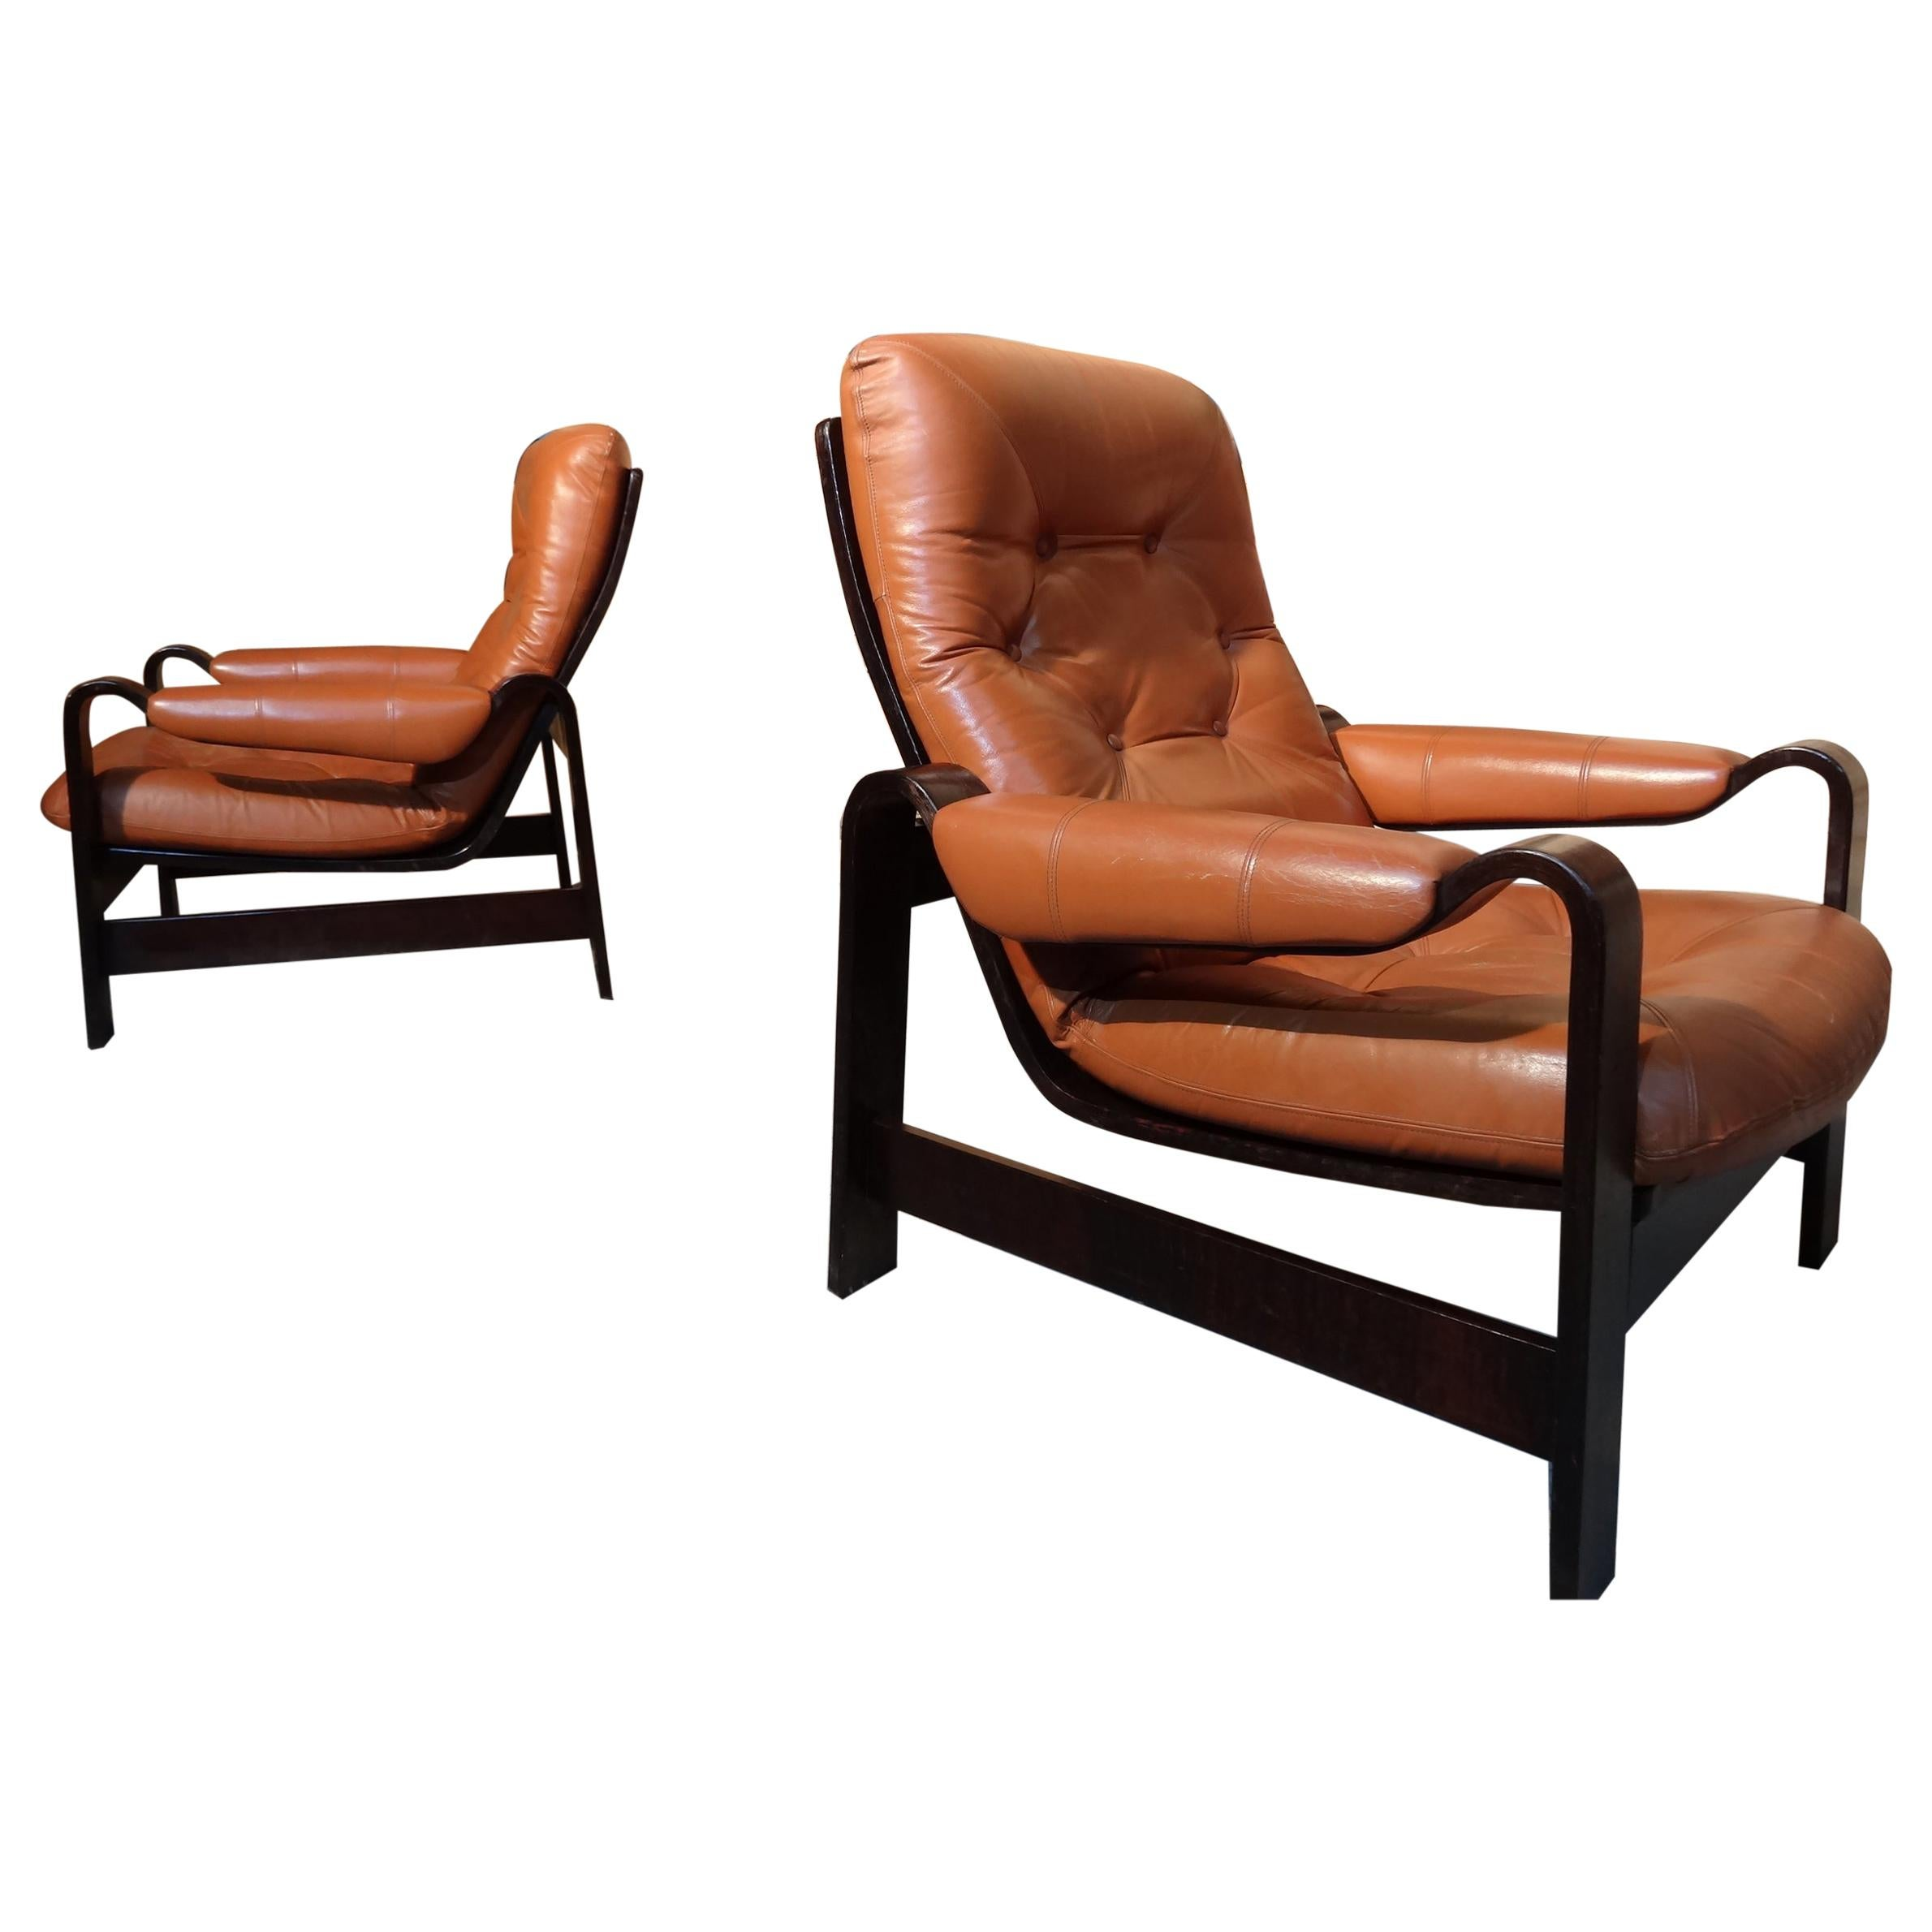 1970s Vintage Retro Dutch Coja Leather Bentwood Arm Chair or Club Chair